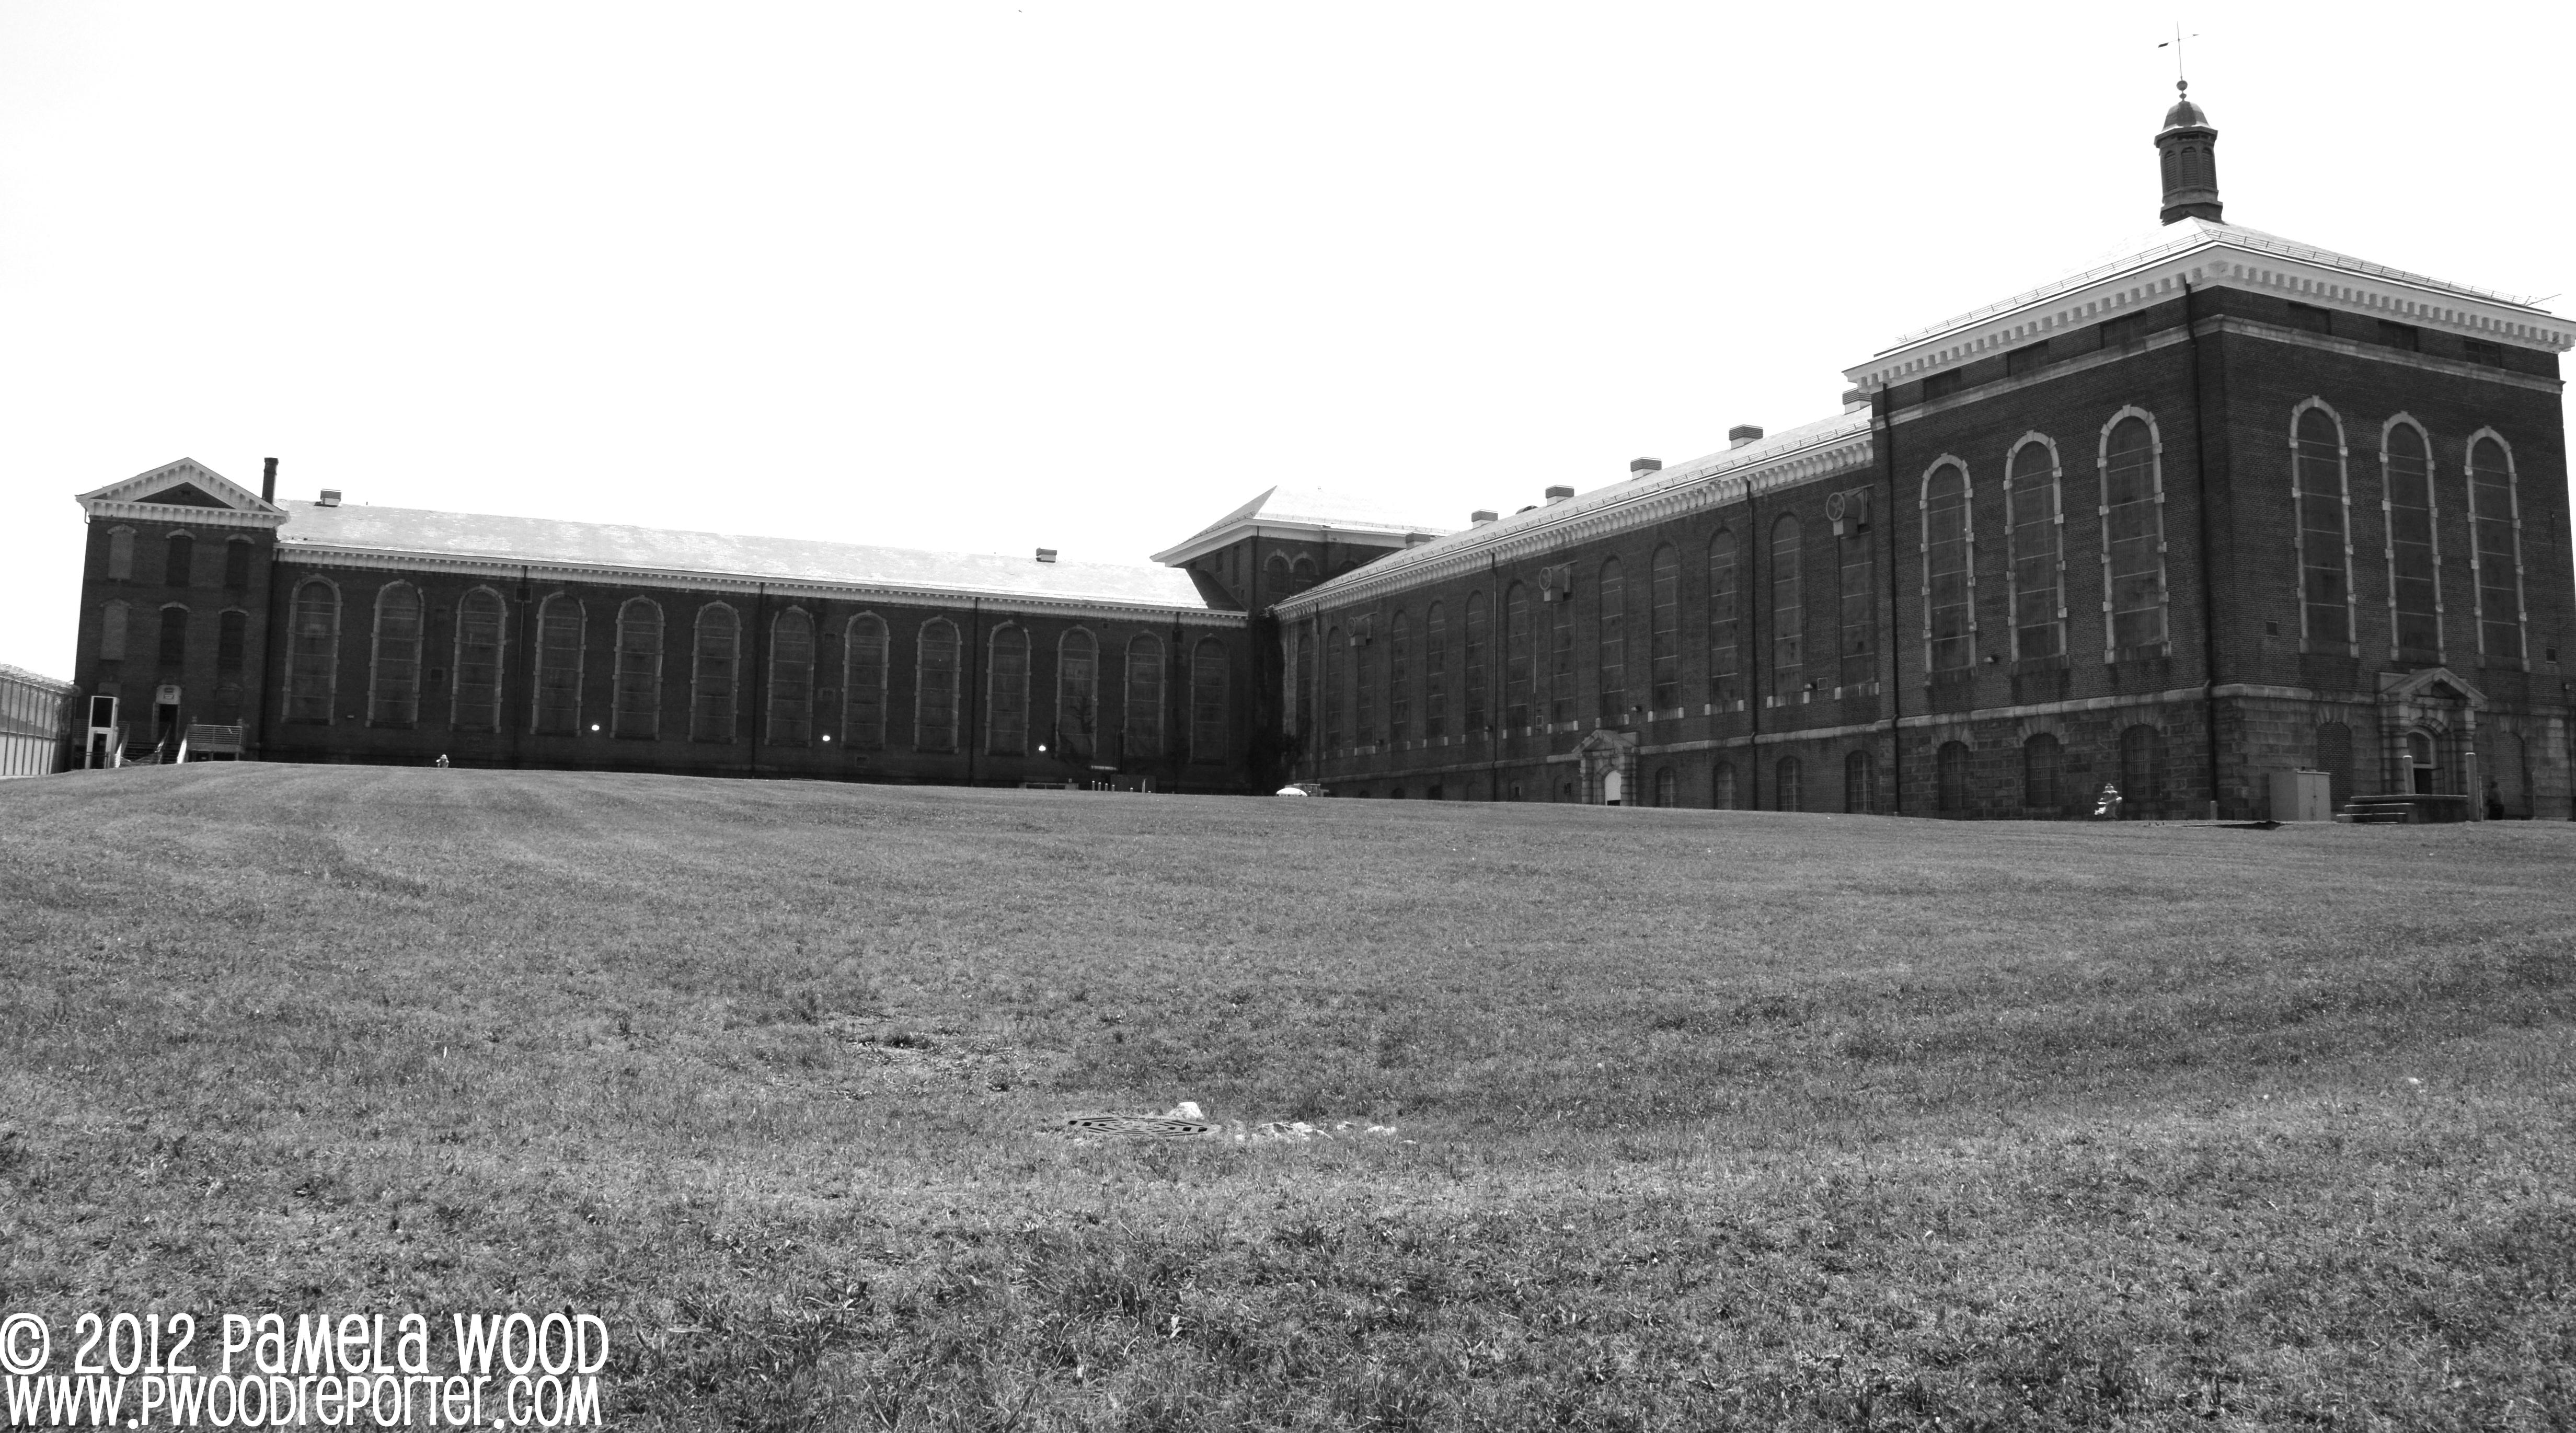 http://pwoodreporter.files.wordpress.com/2012/08/prison23-copy.jpg